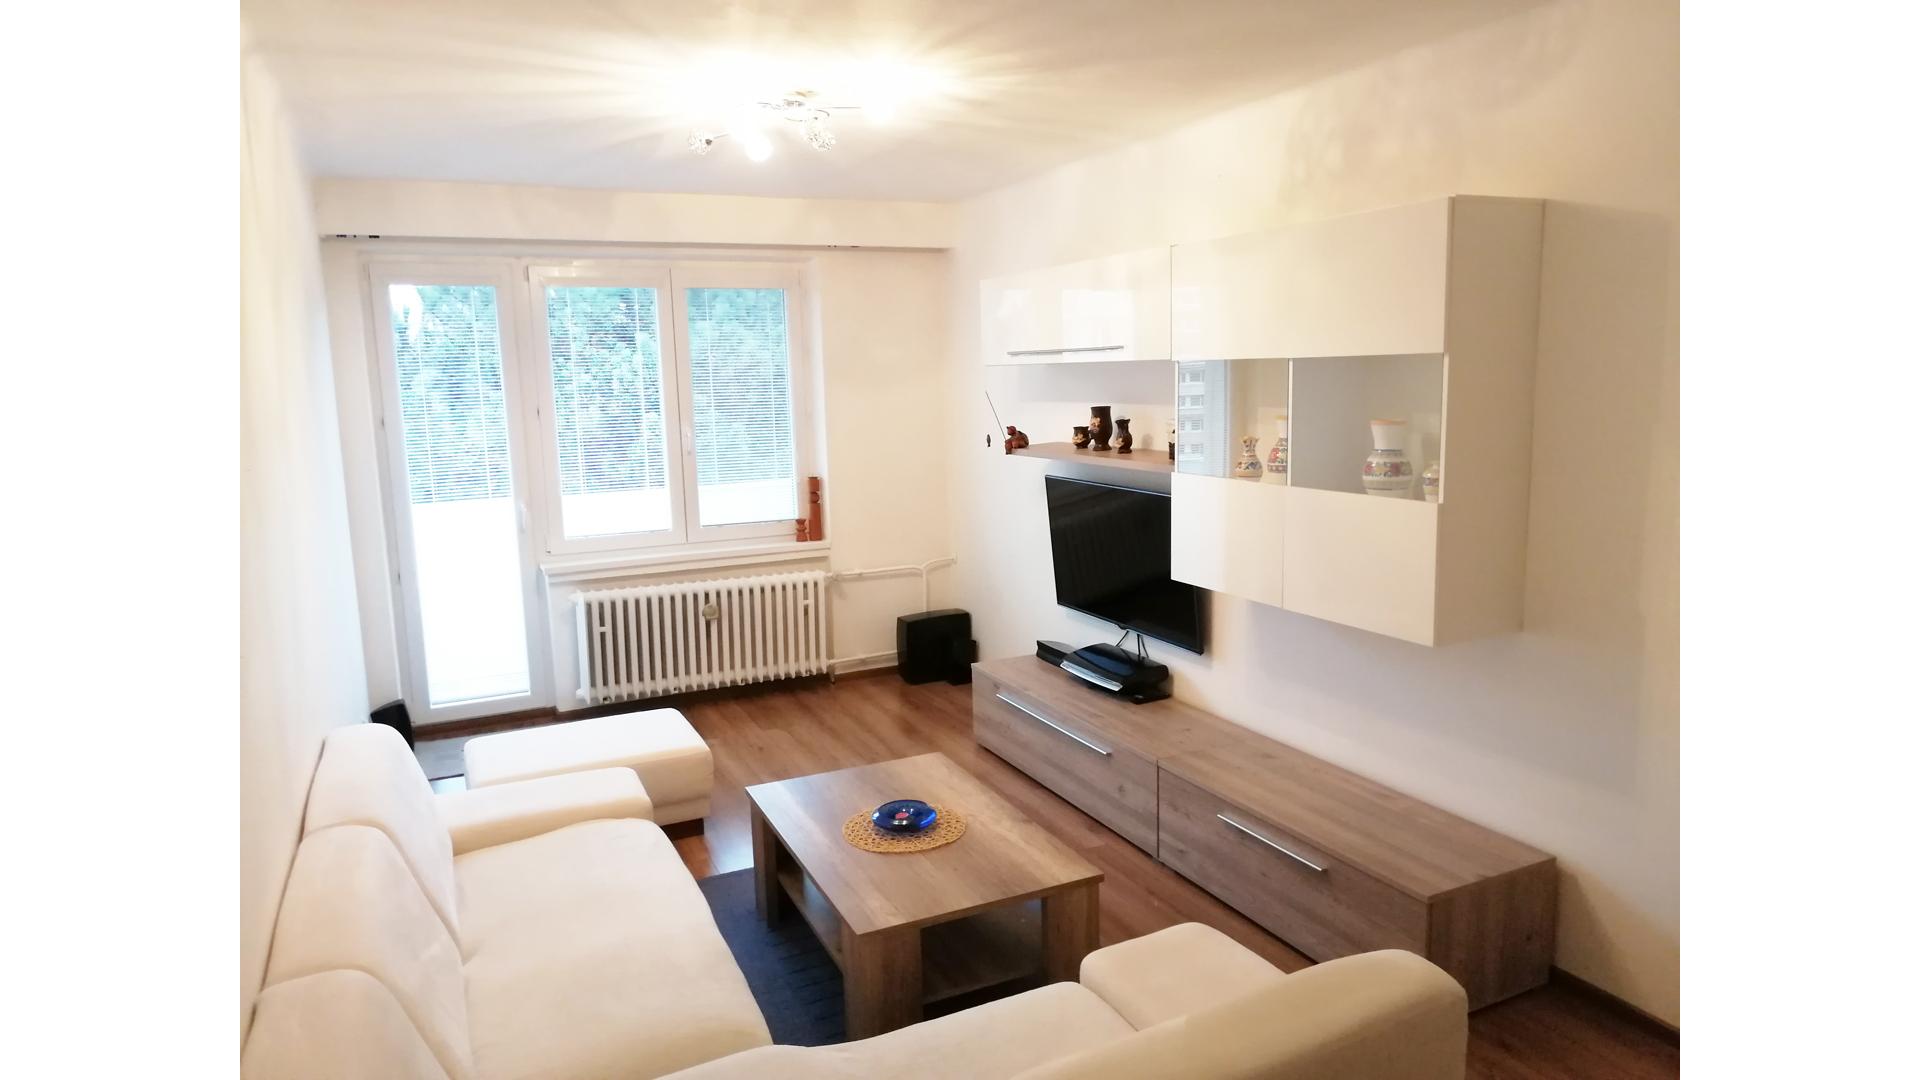 3 izbový byt s balkónom, Bratislava Ružinov – PRENAJATÉ